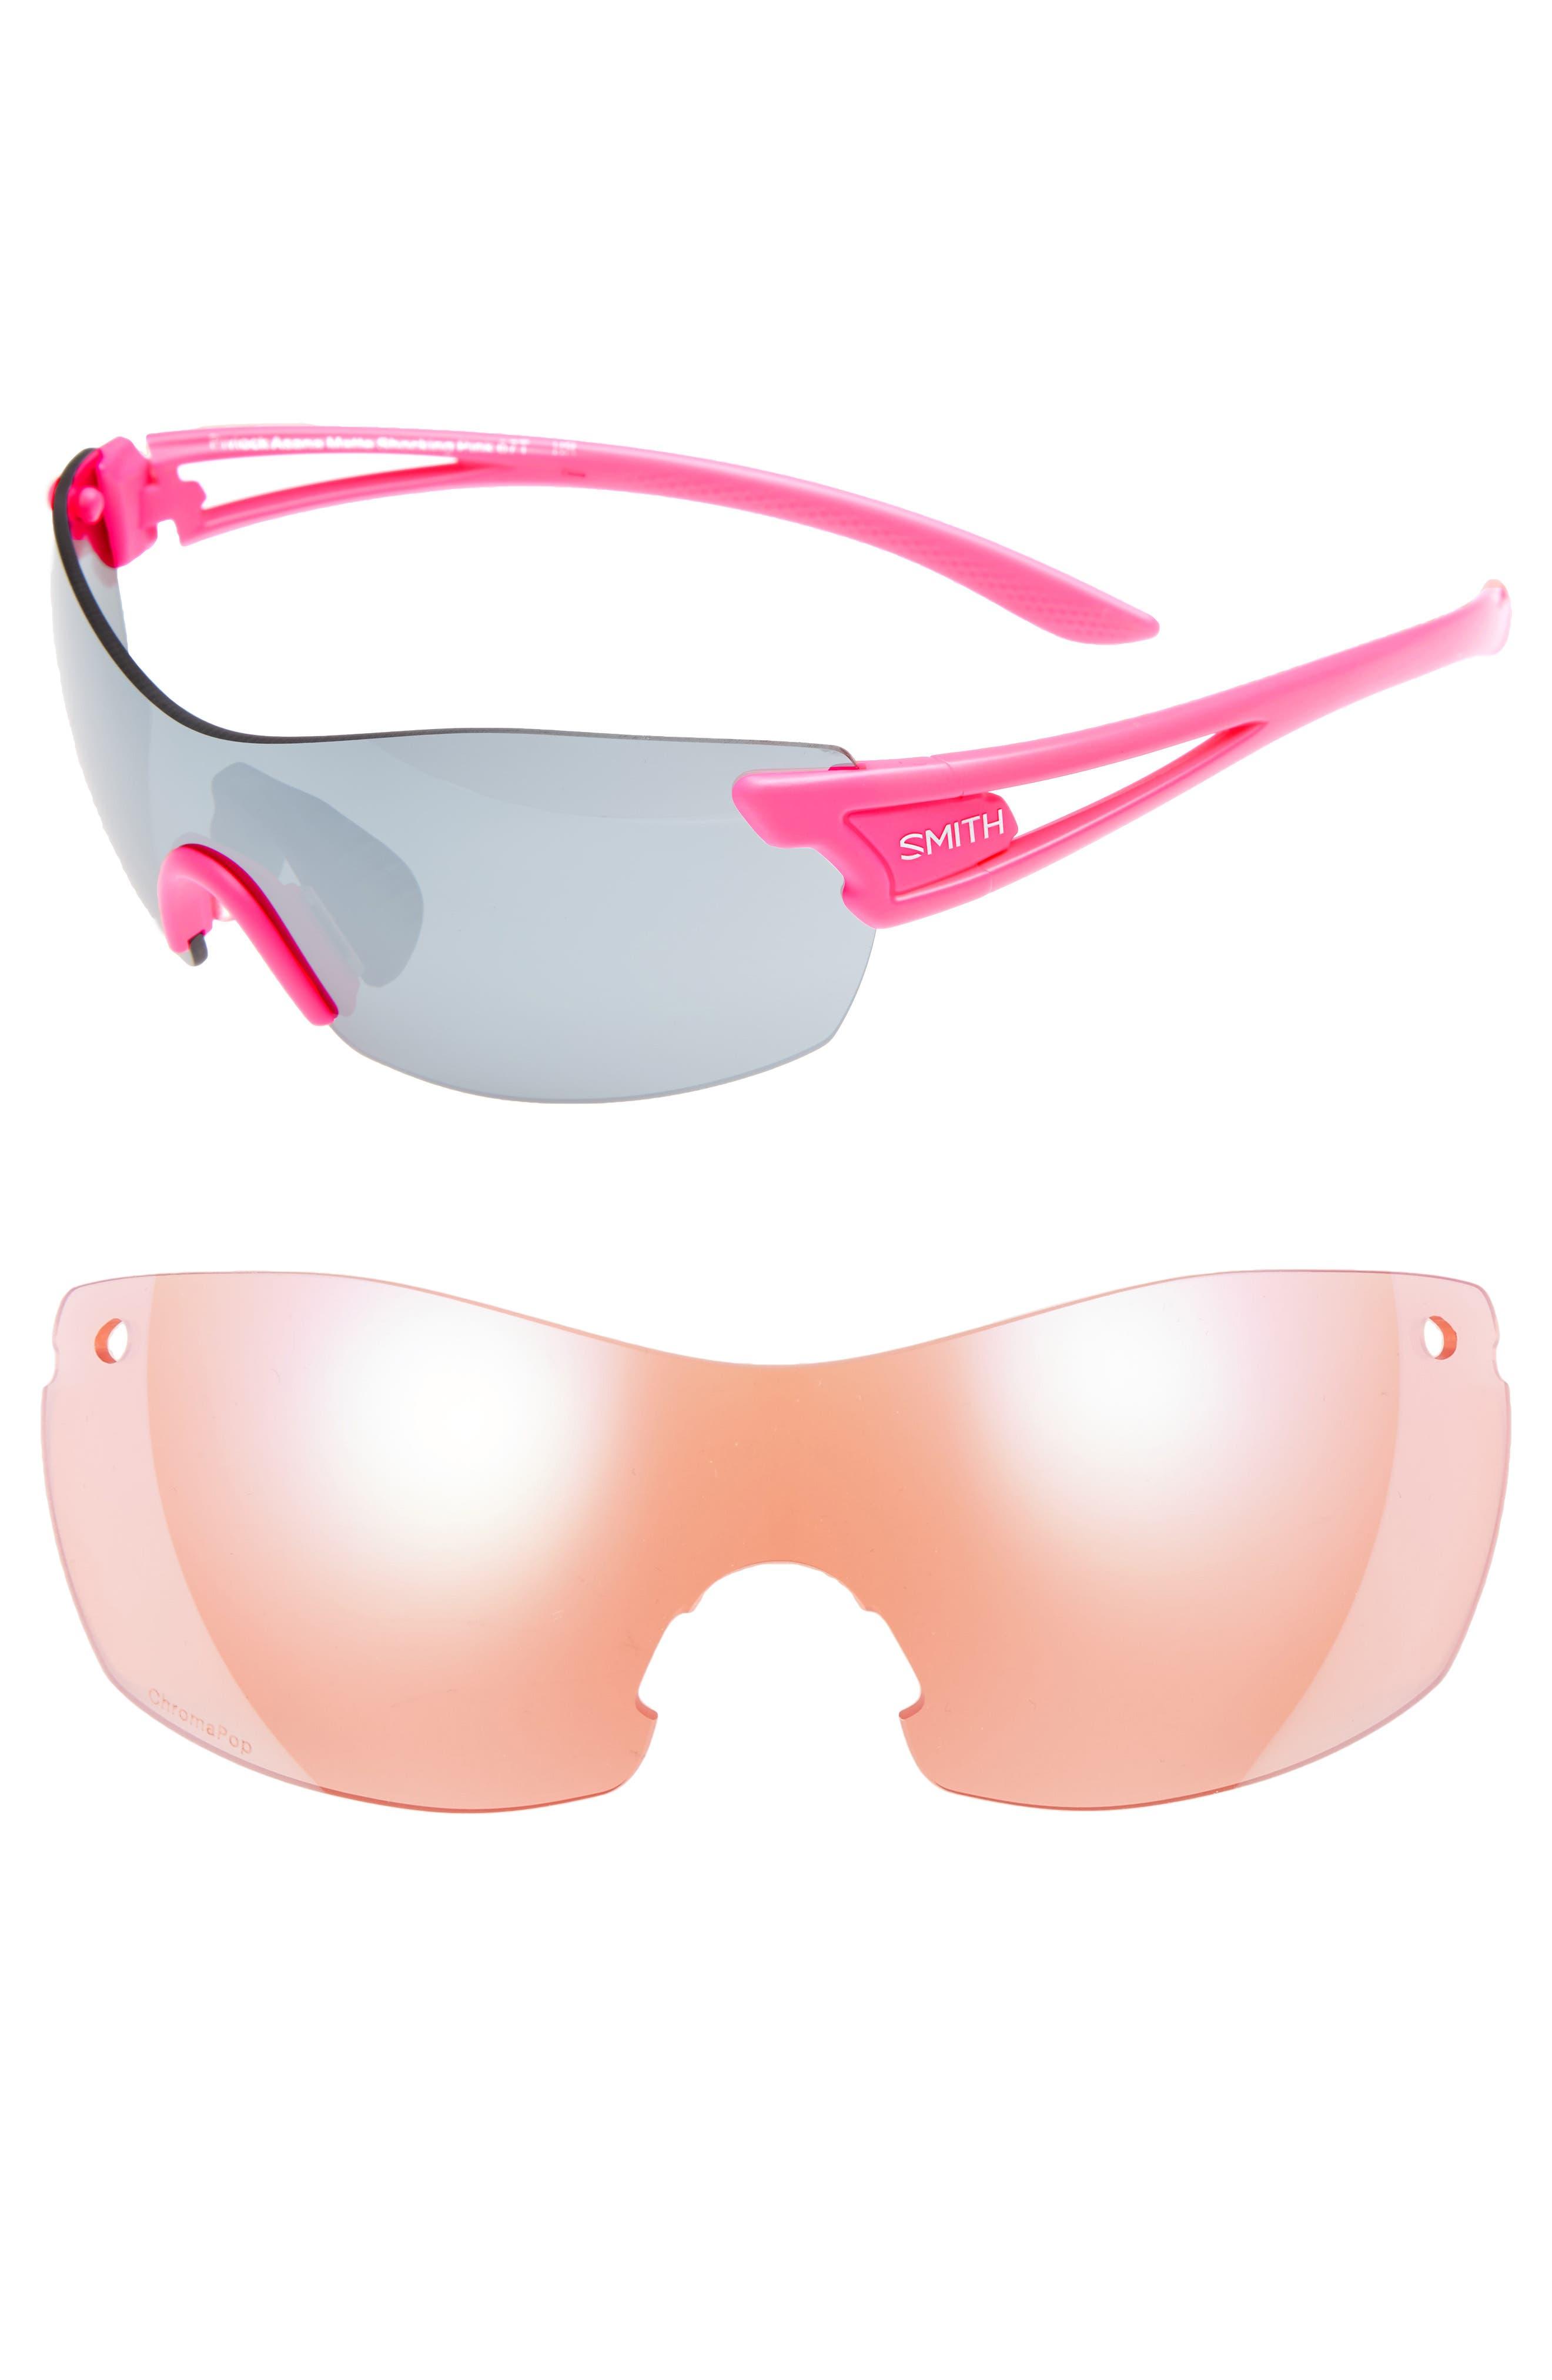 Main Image - Smith PivLock™ Asana 125mm ChromaPop Polarized Sunglasses